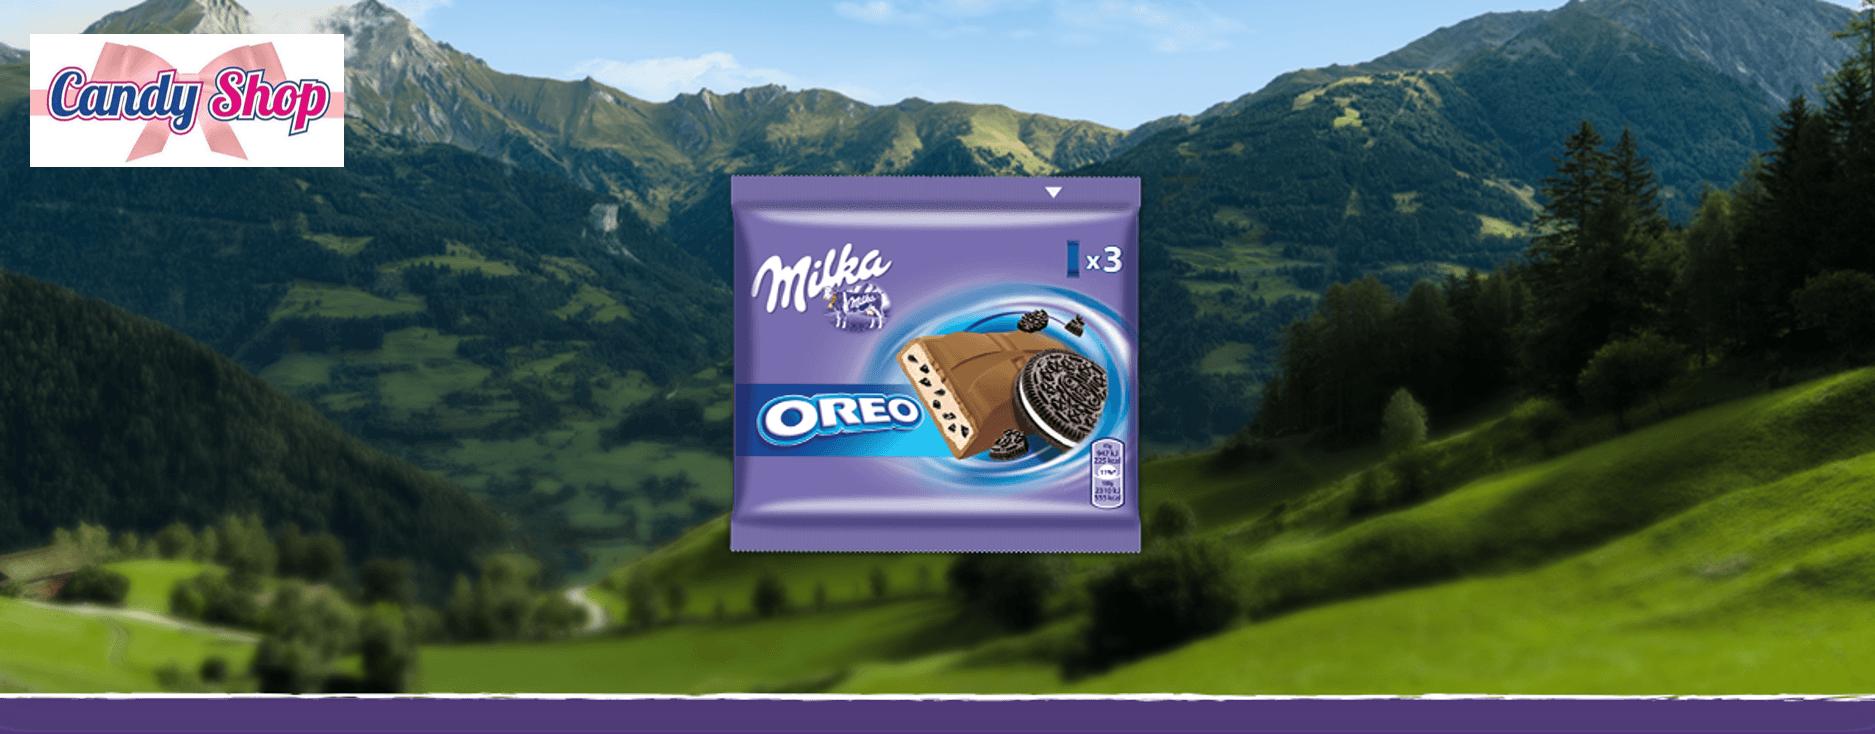 Prodotti Milka - Candy Shop Torino